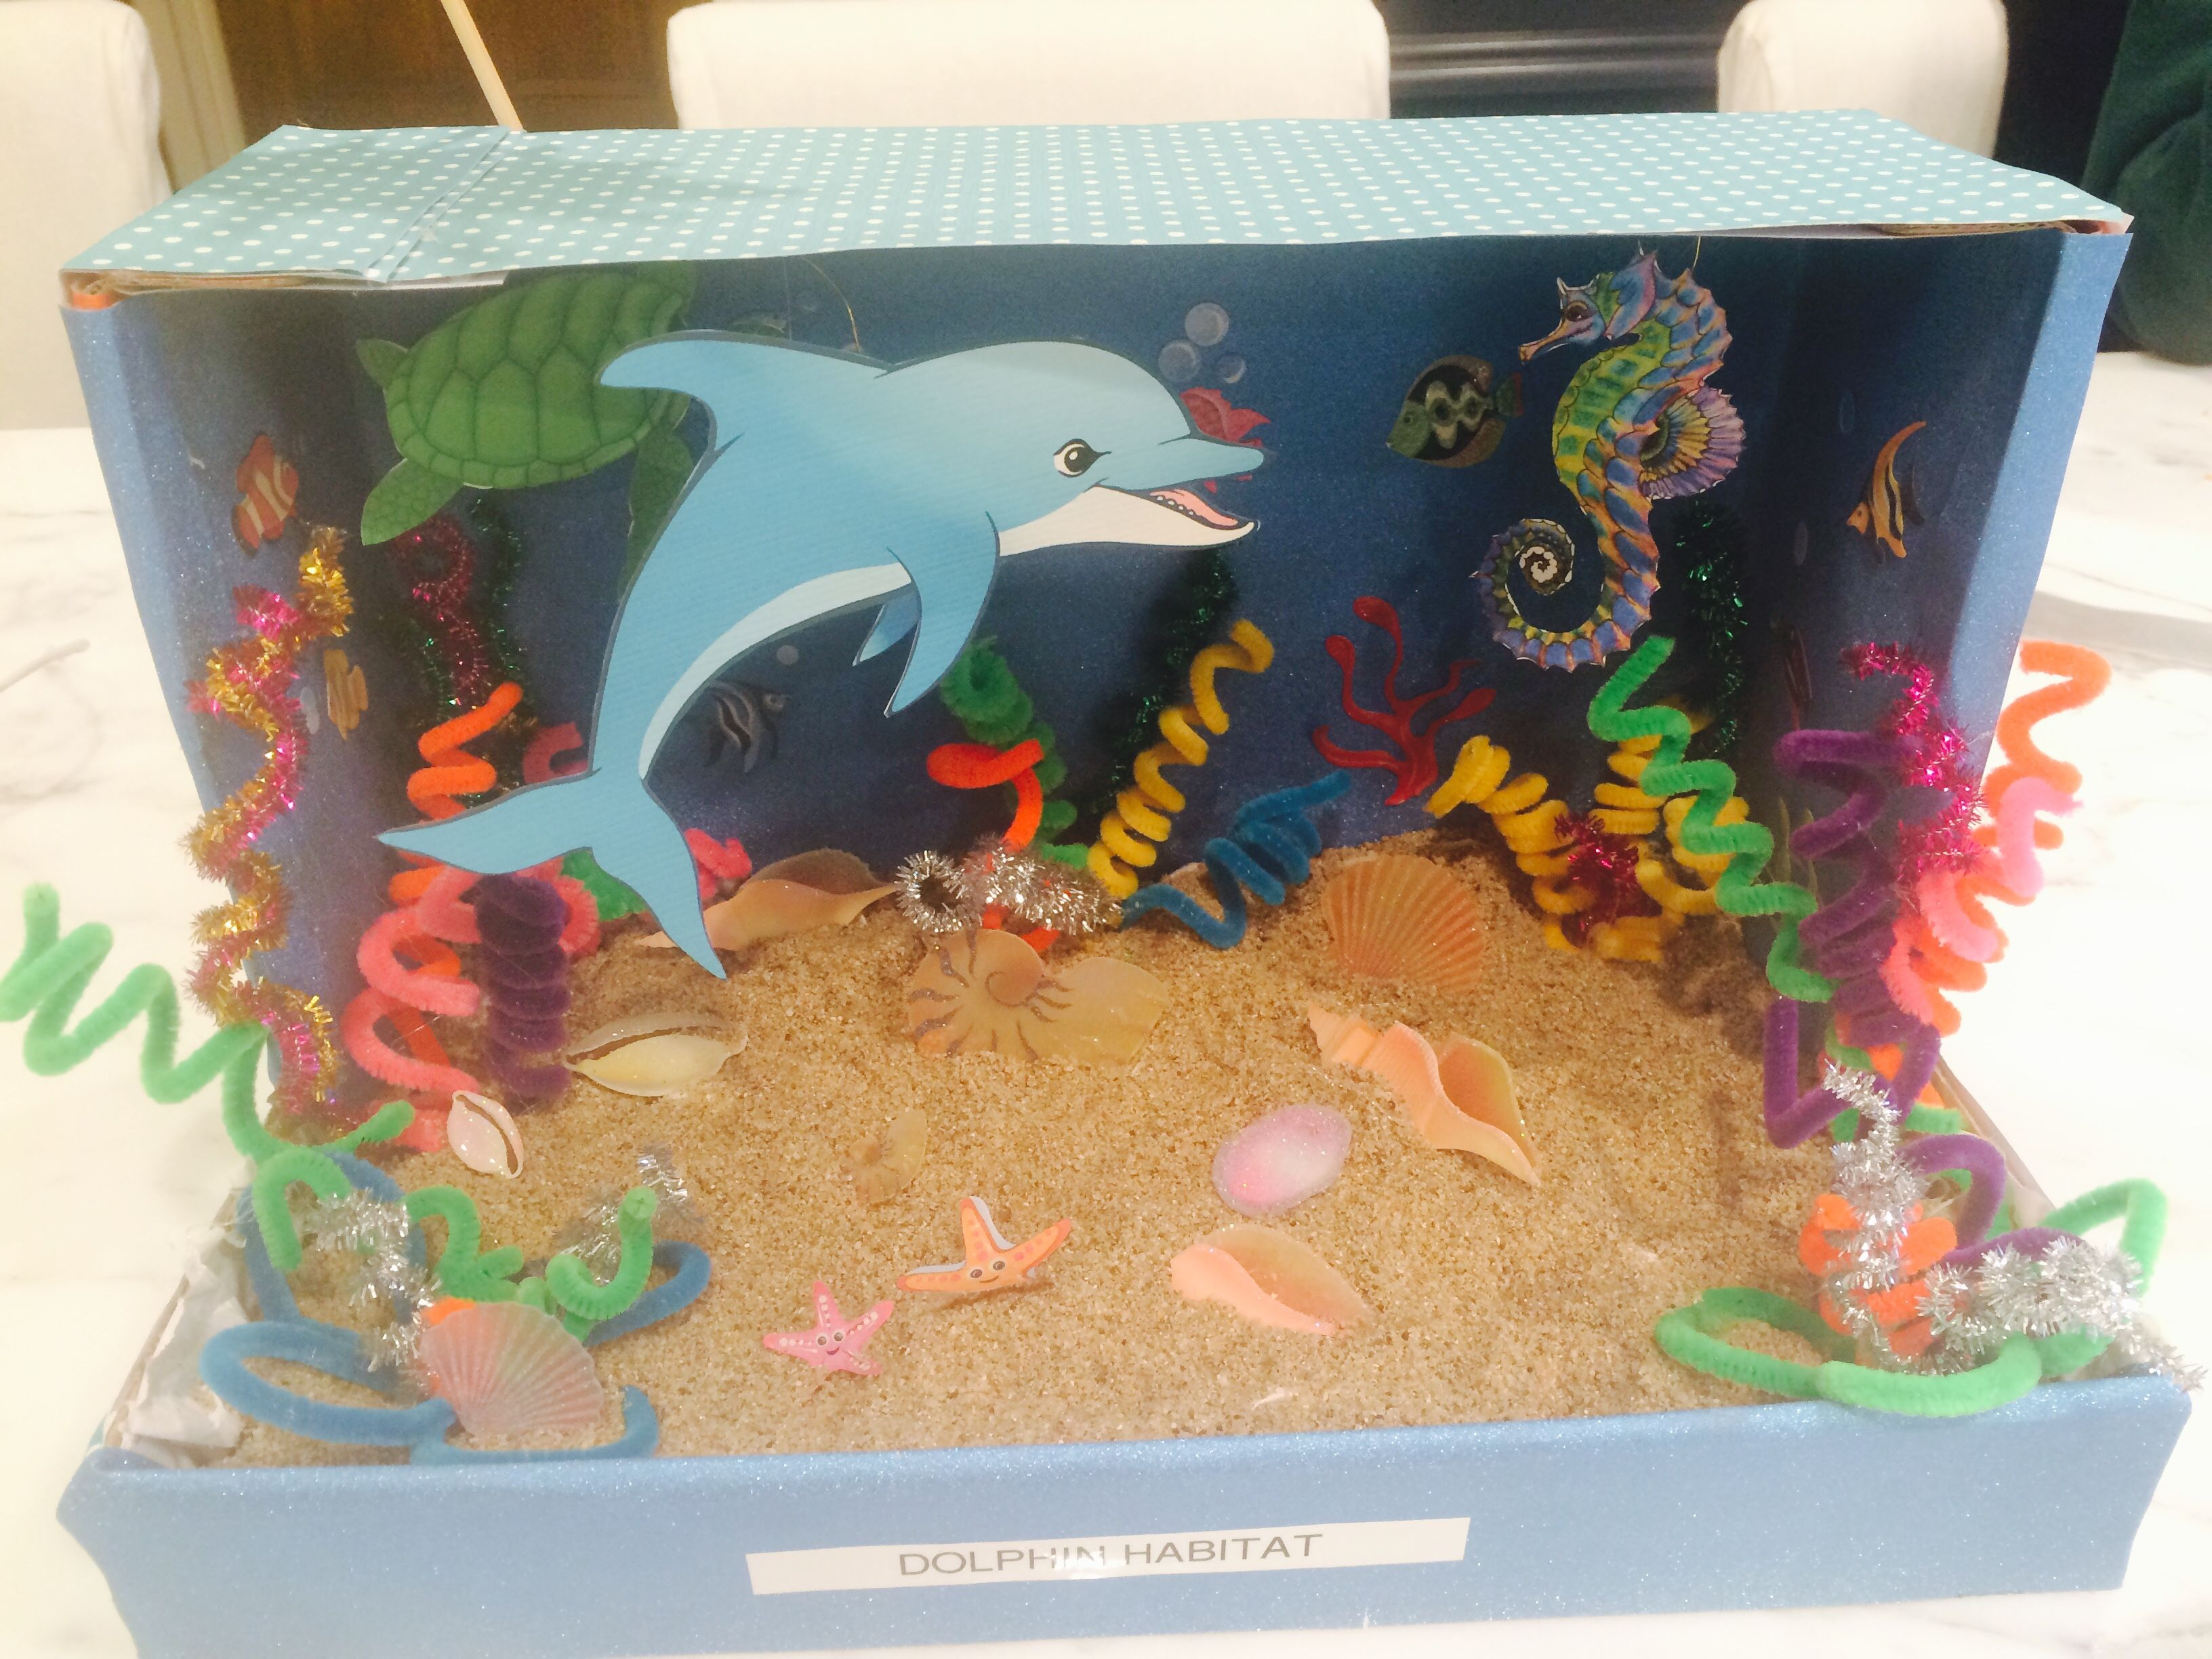 Dolphin Diorama